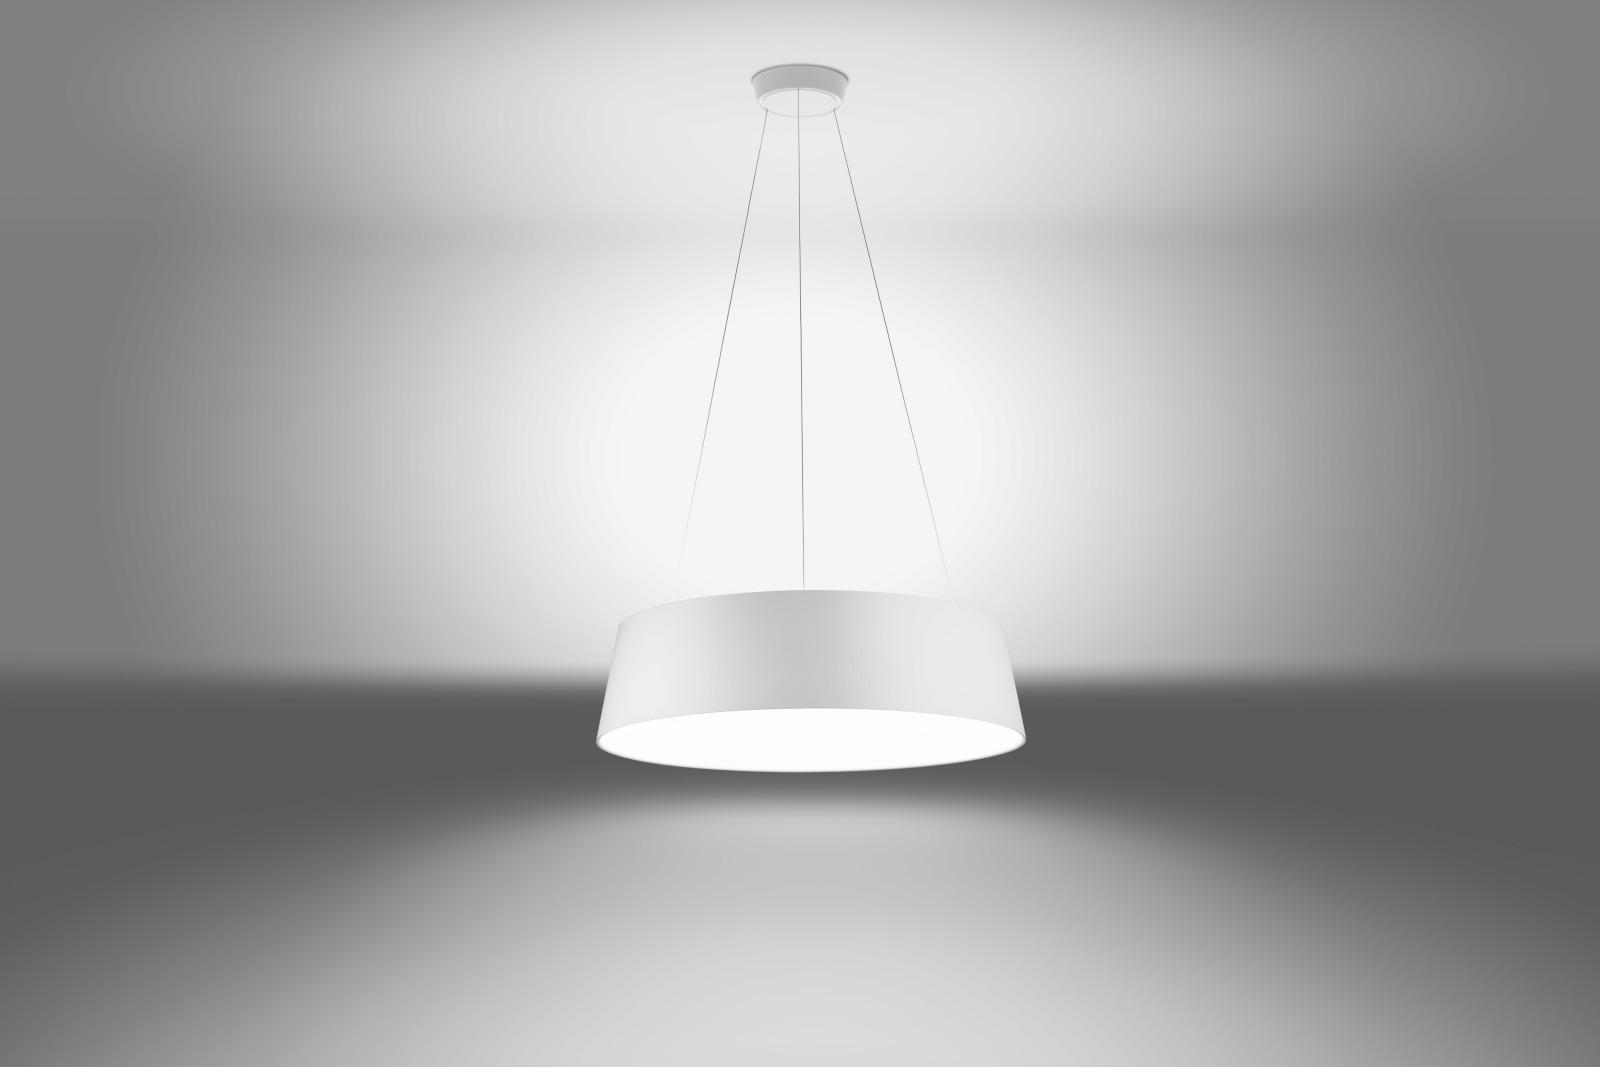 Lampadari per cucina moderna lampadario moderno cucina s